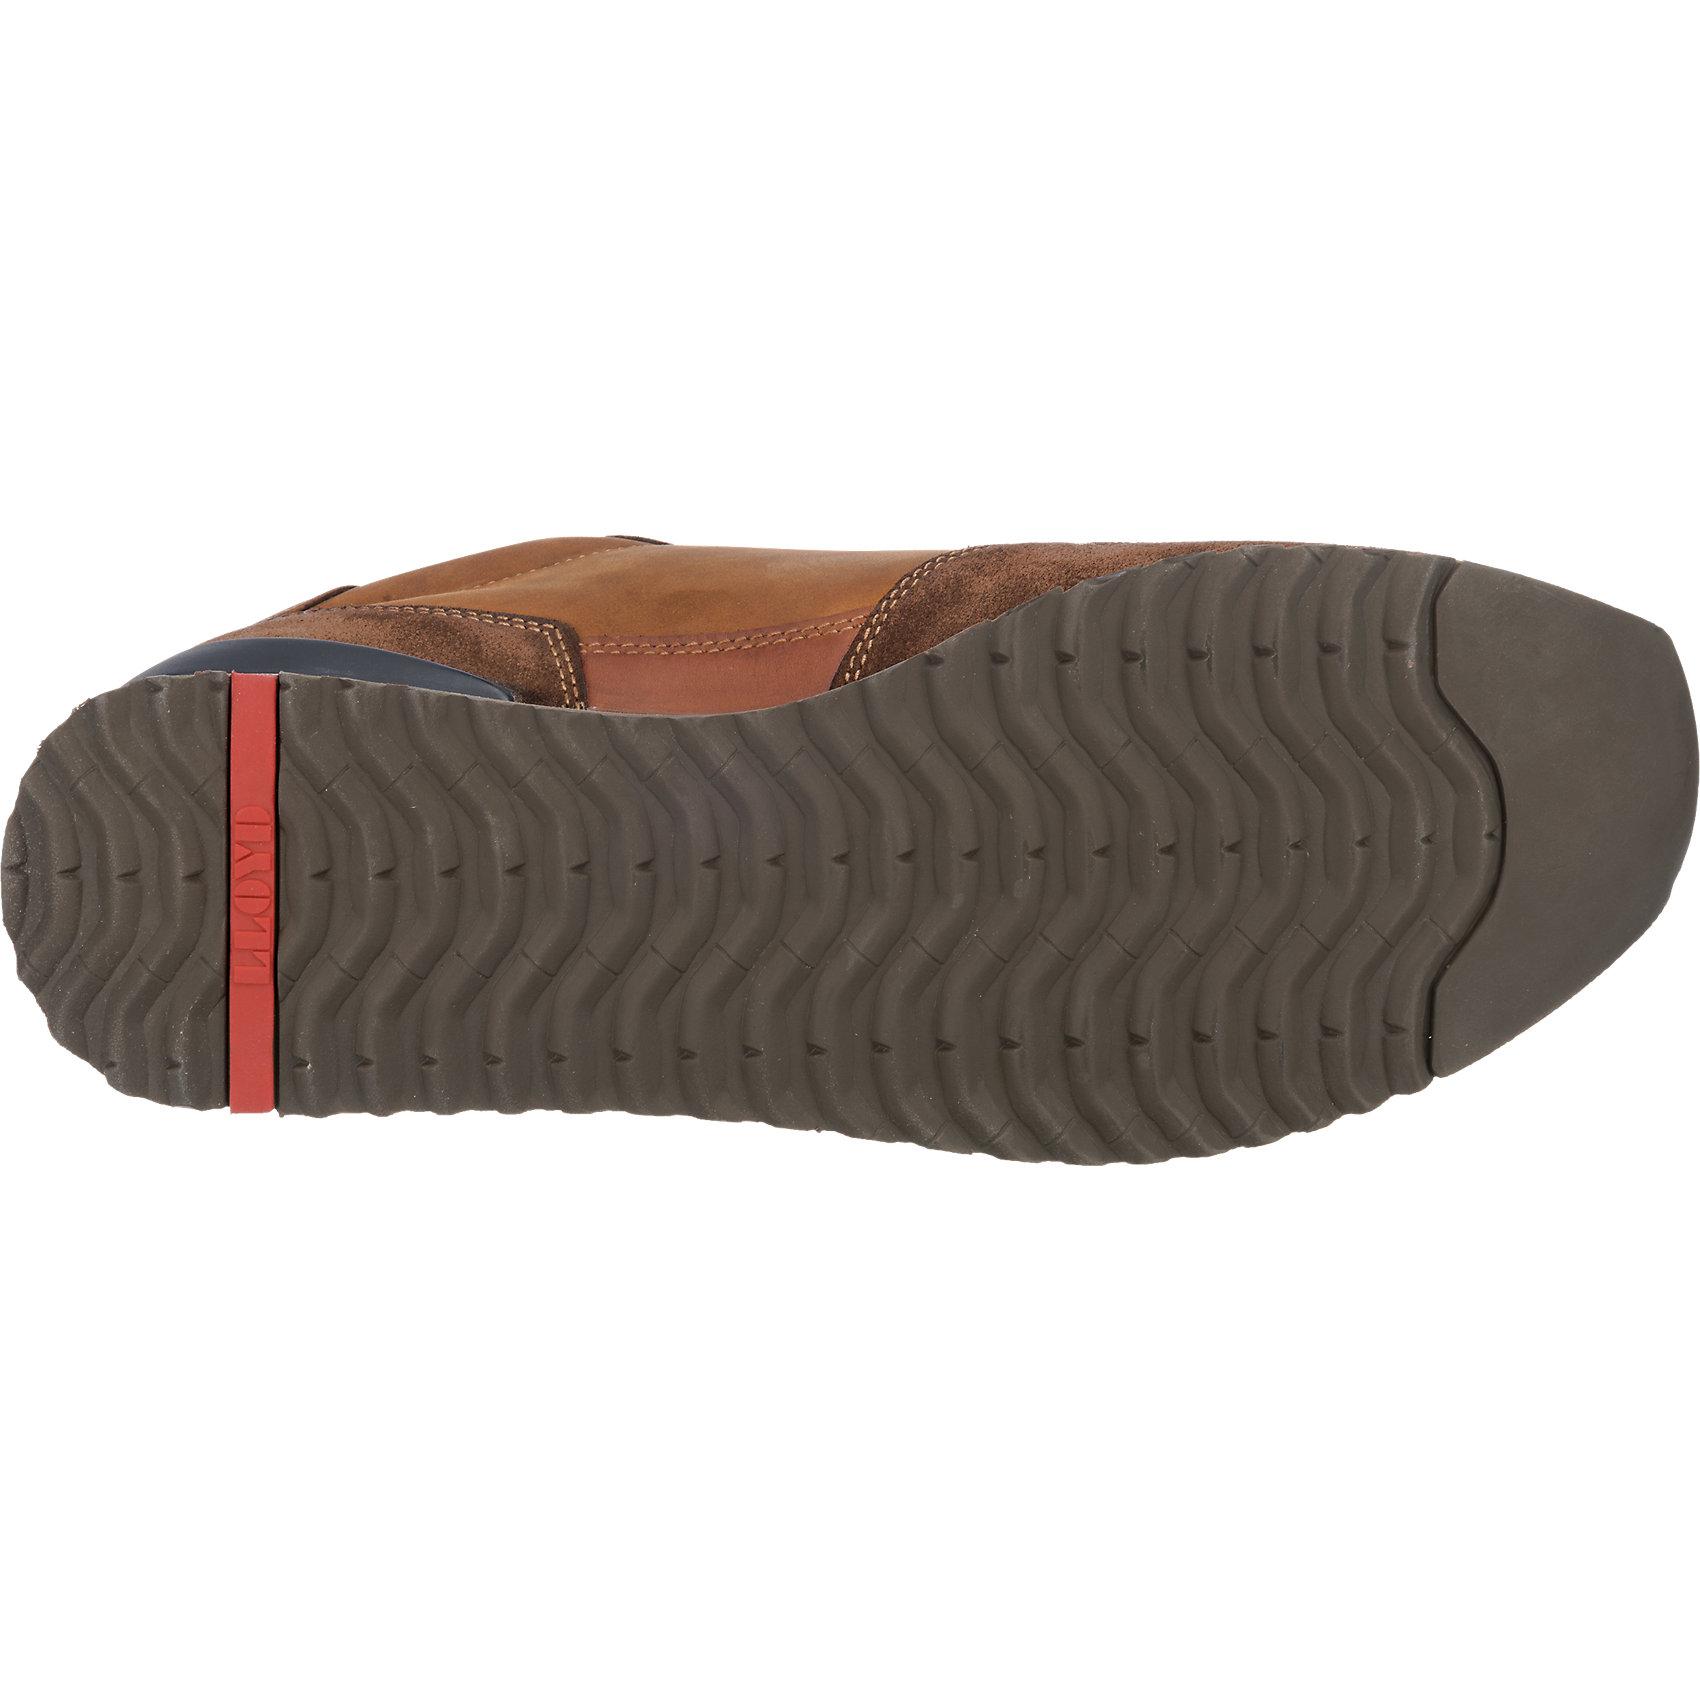 Neu LLOYD Edwin Sneakers blau-kombi grau-kombi braun 5760325